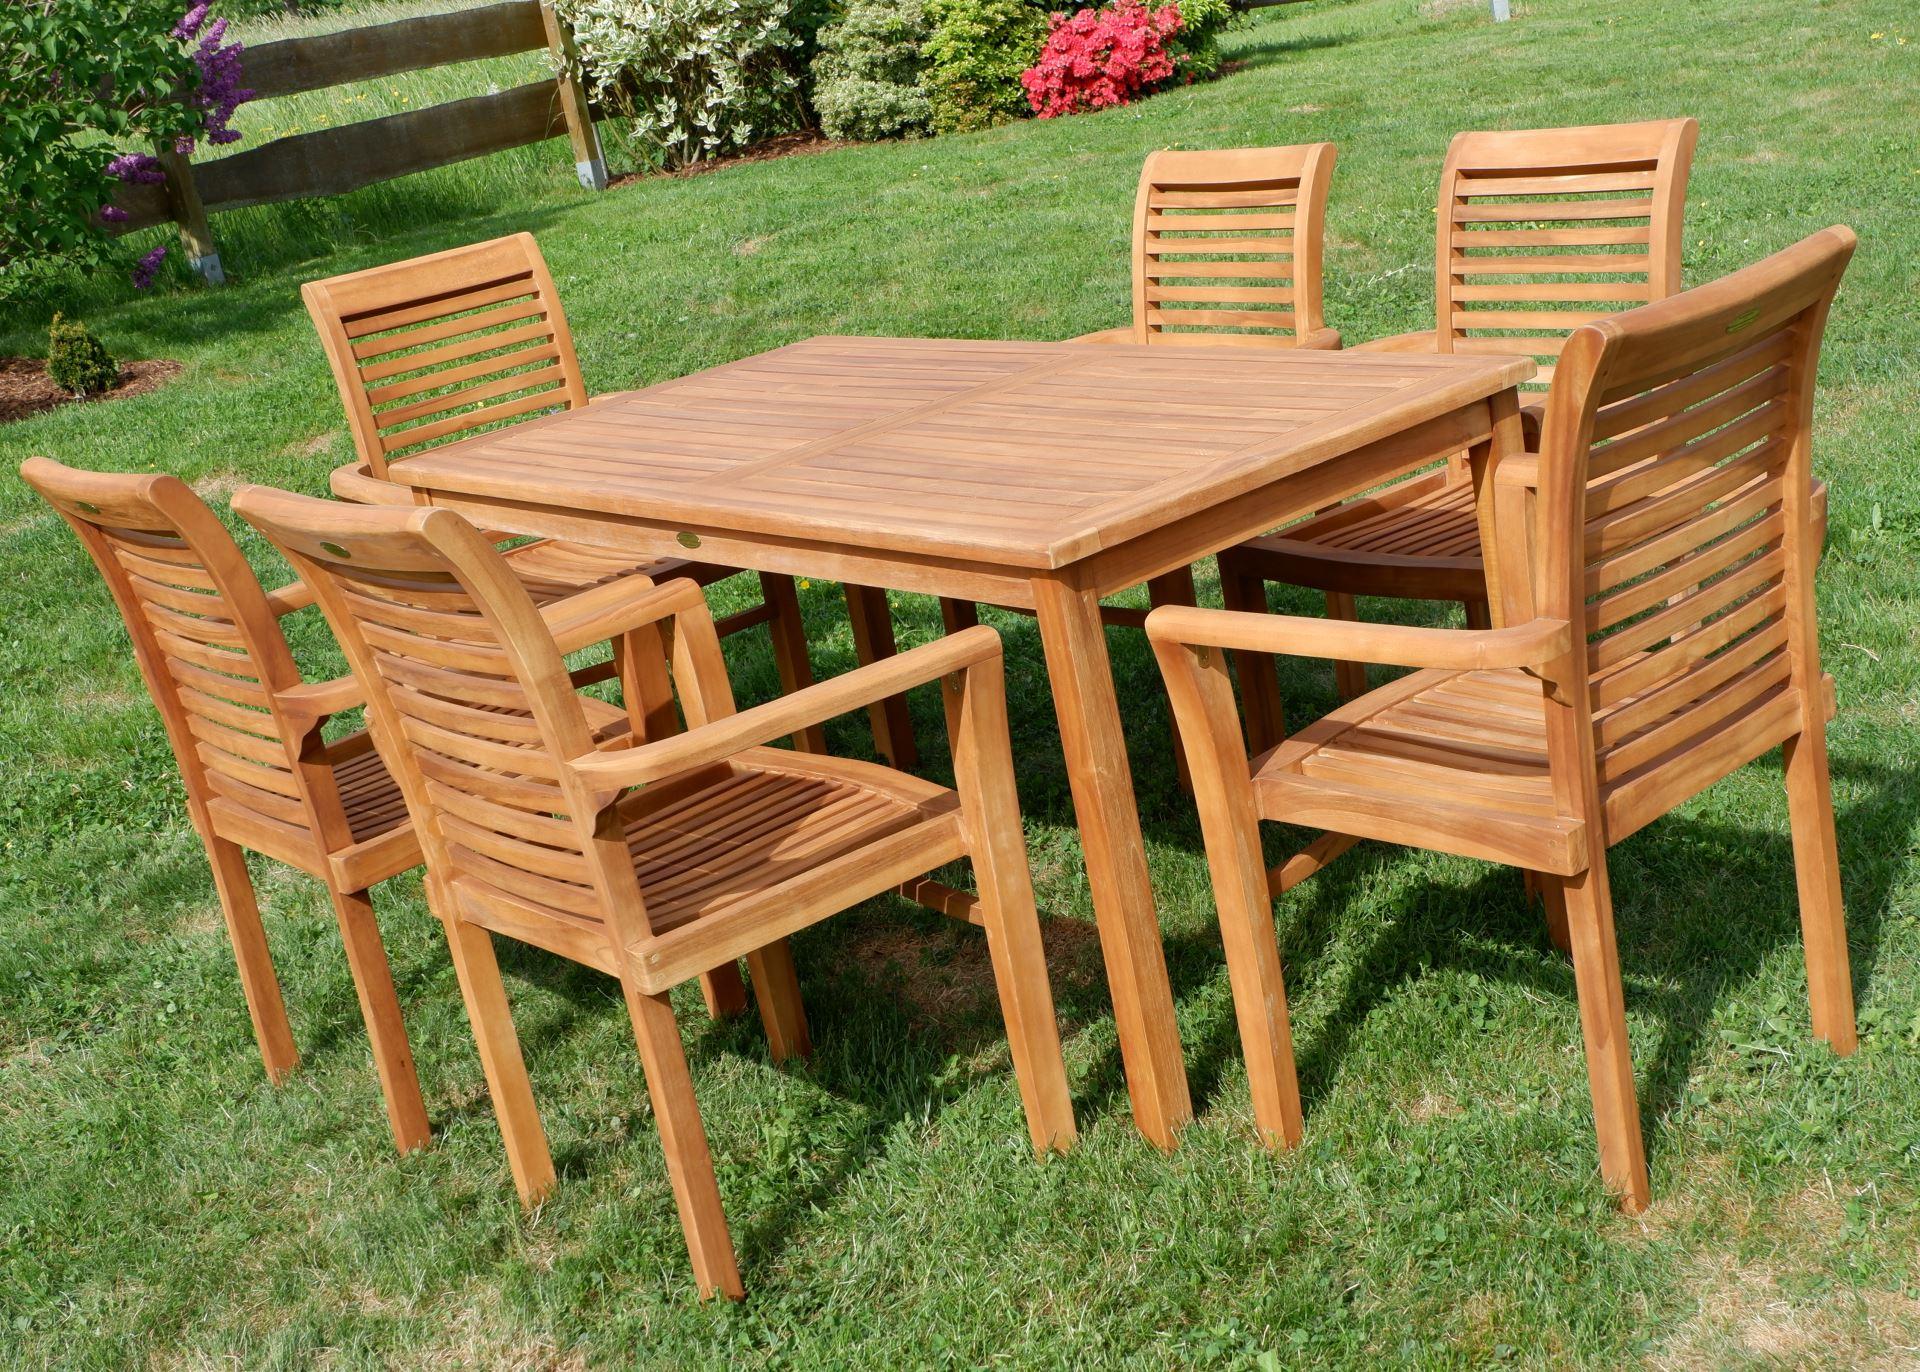 Tisch 150x80.Teak Set Gartengarnitur Alpen Tisch 150x80 6 Alpen Sessel Serie Jav